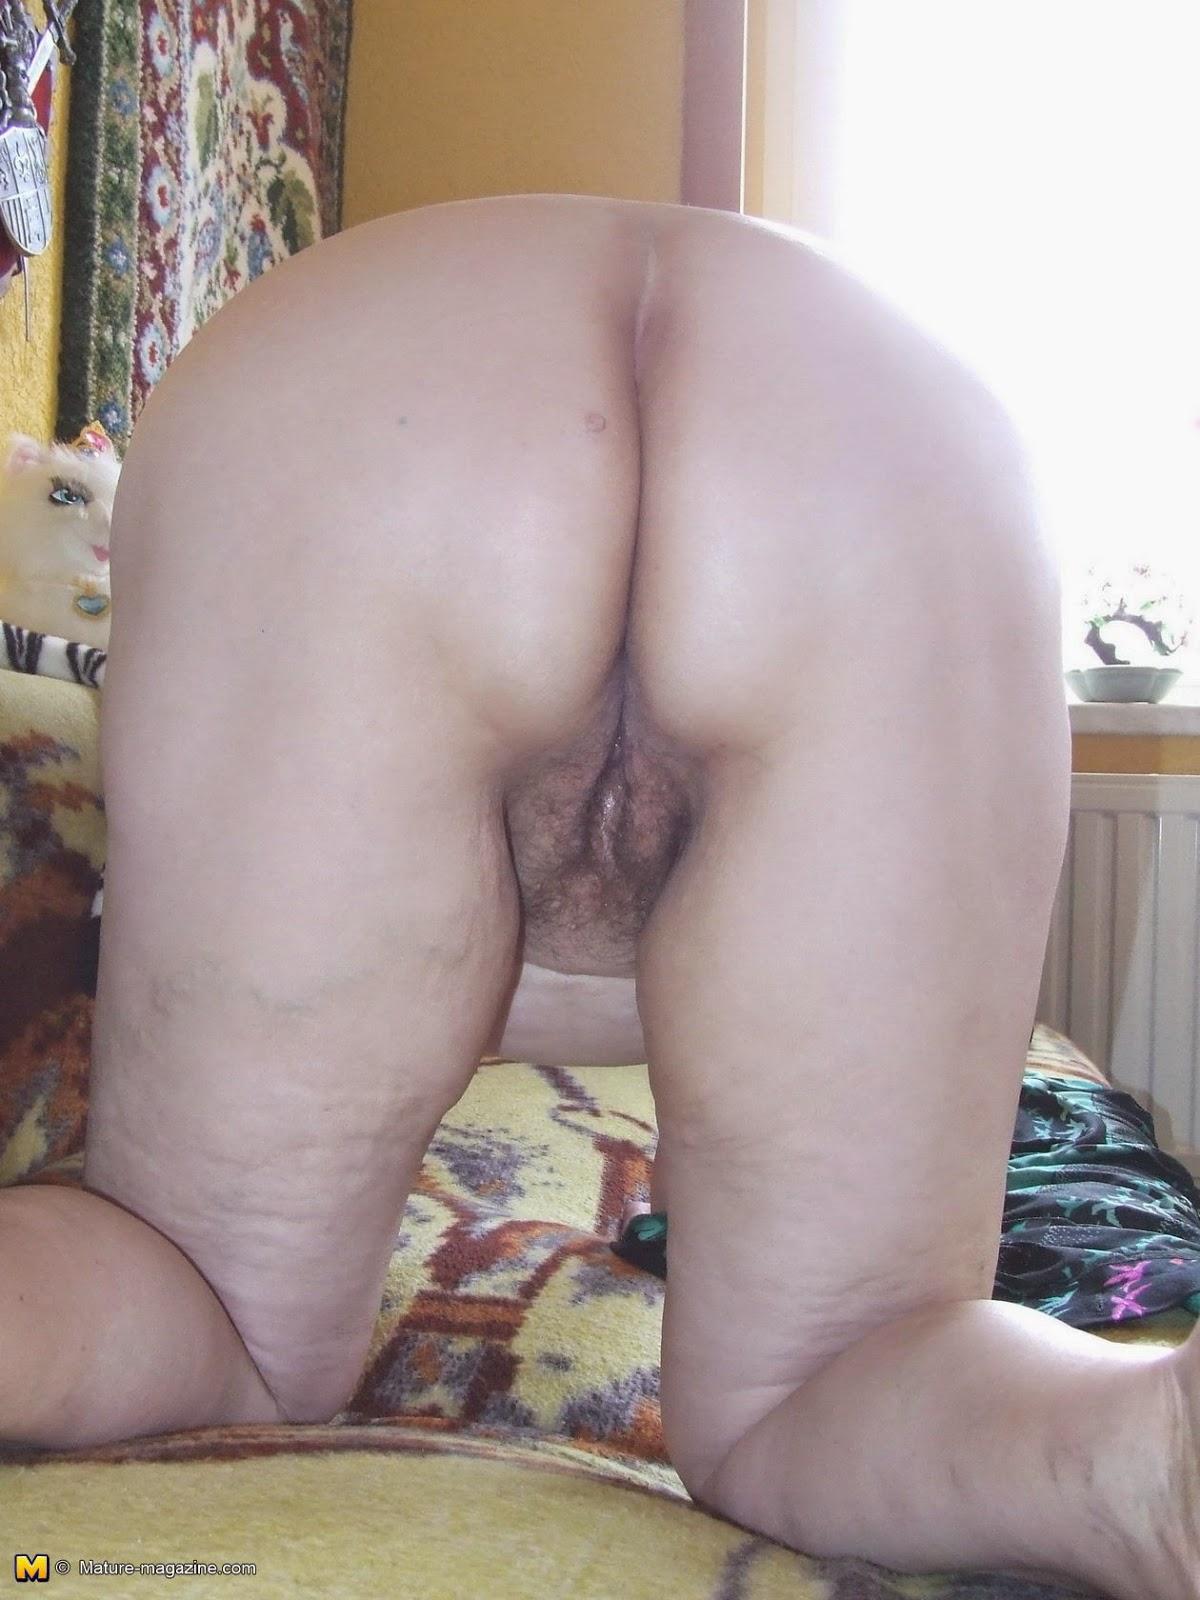 Apertadinho!!!! adult mature women solo pics Asian and